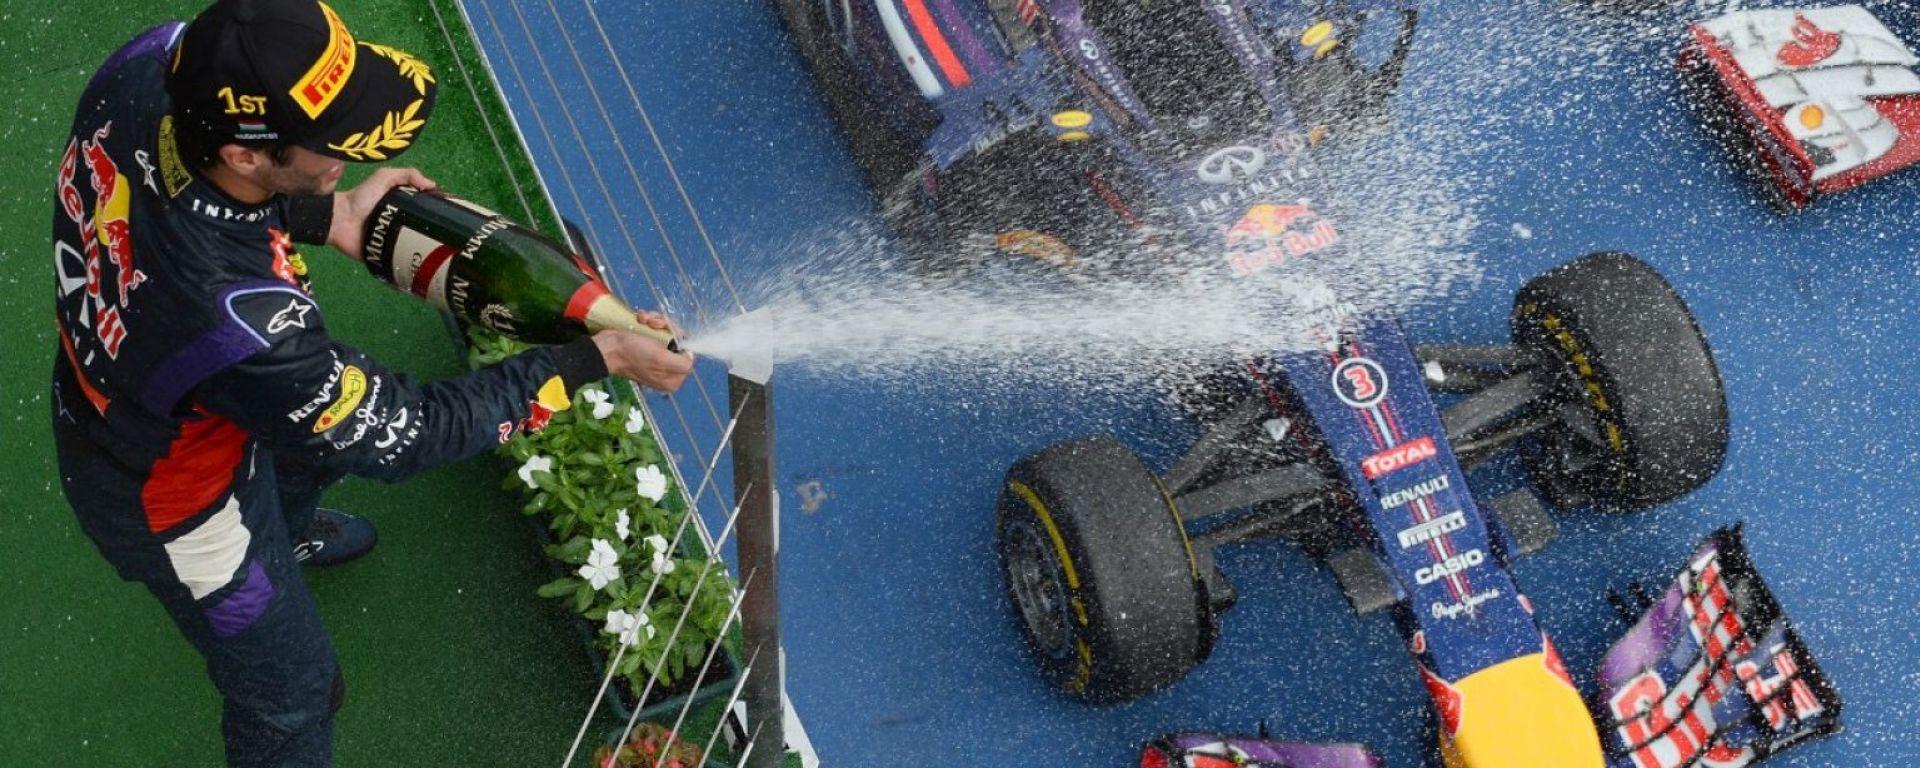 Daniel Ricciardo - GP Ungheria 2014